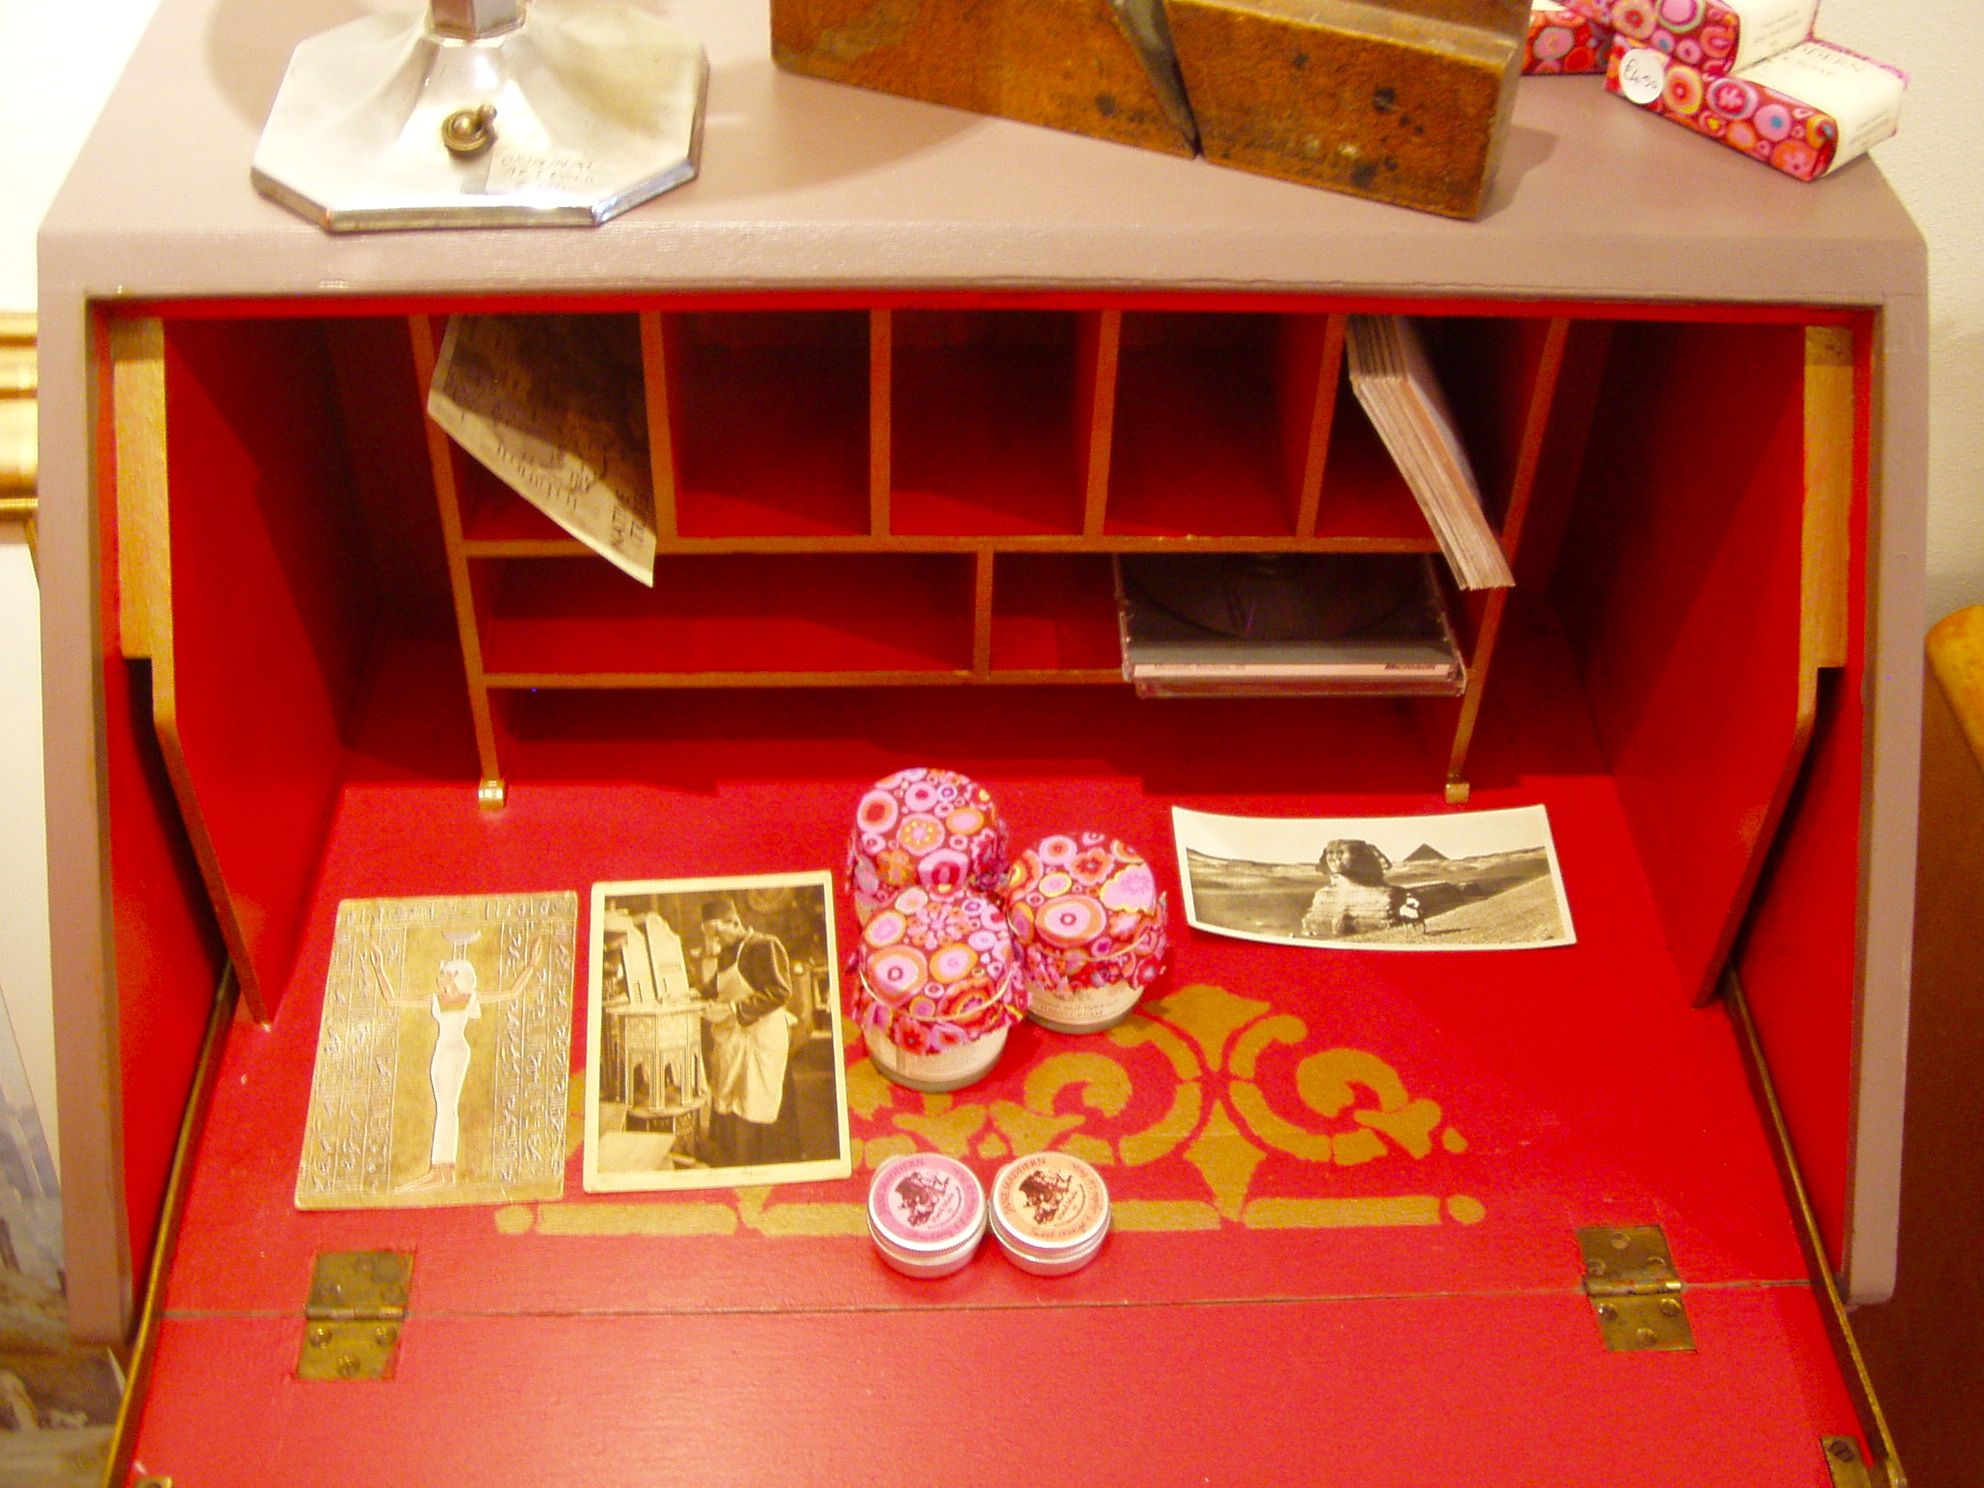 Bureau from cherubim stockbridge edinburgh interiors